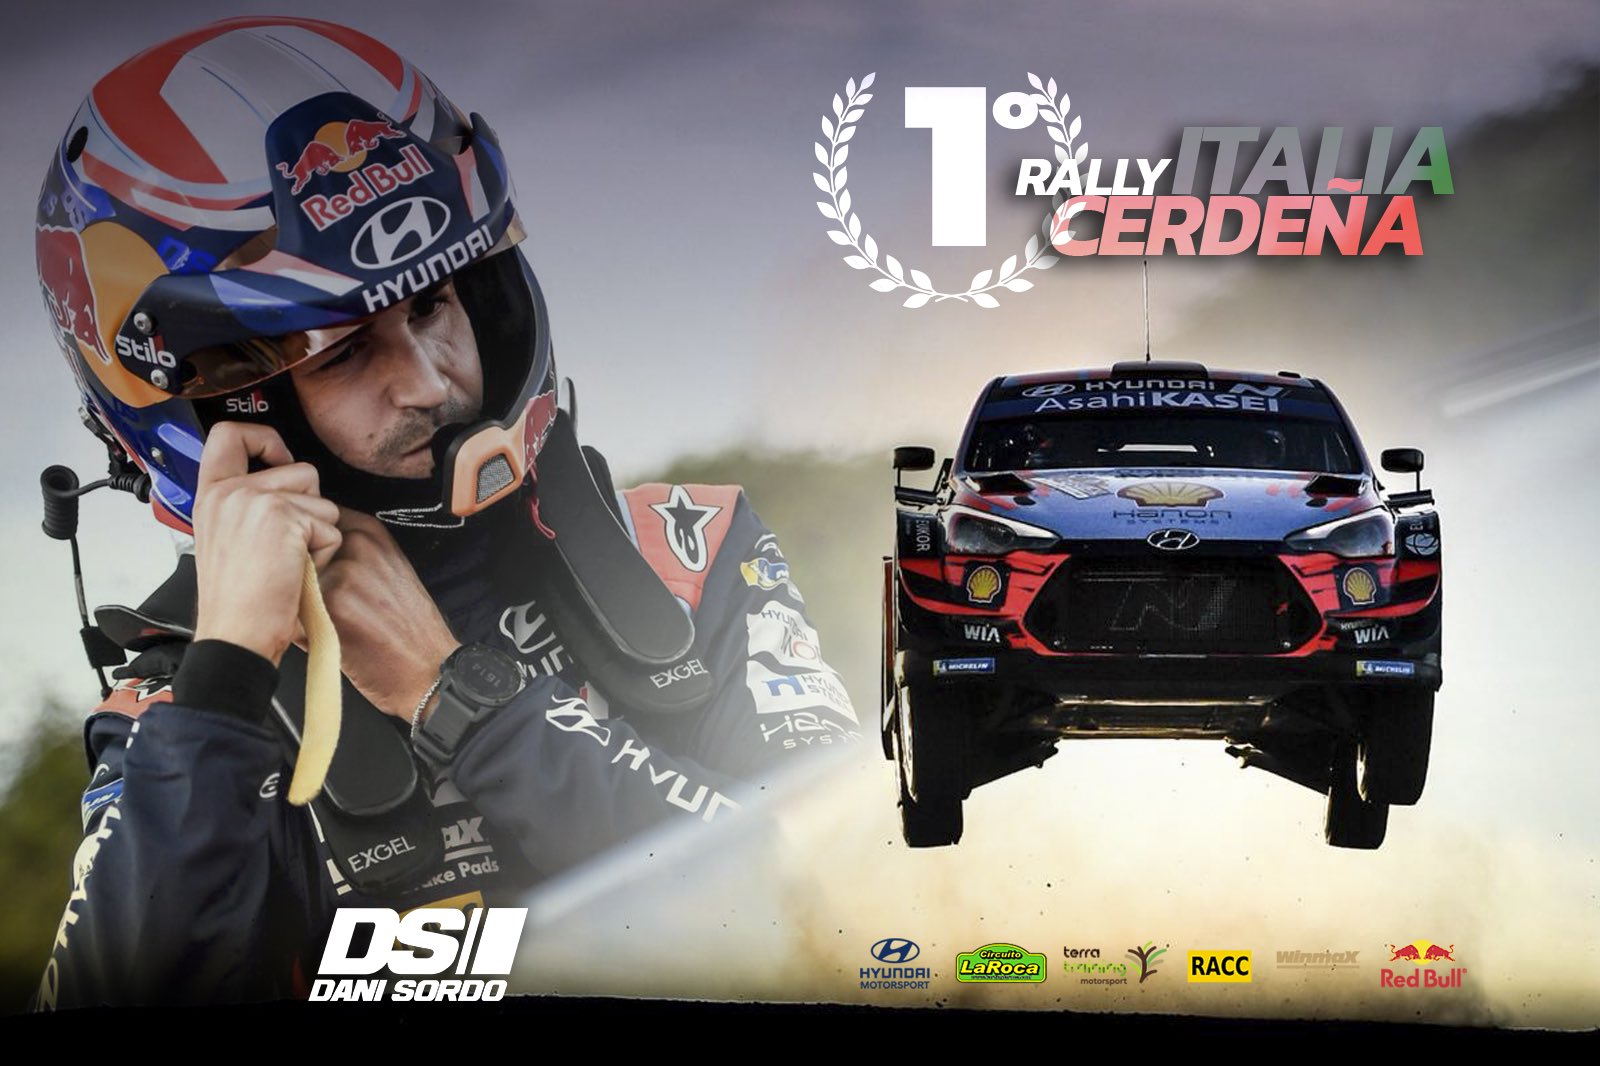 WRC: Rally d' Italia - Sardegna [8-10 Octubre] - Página 7 EkC3JdkWoAAT55R?format=jpg&name=large